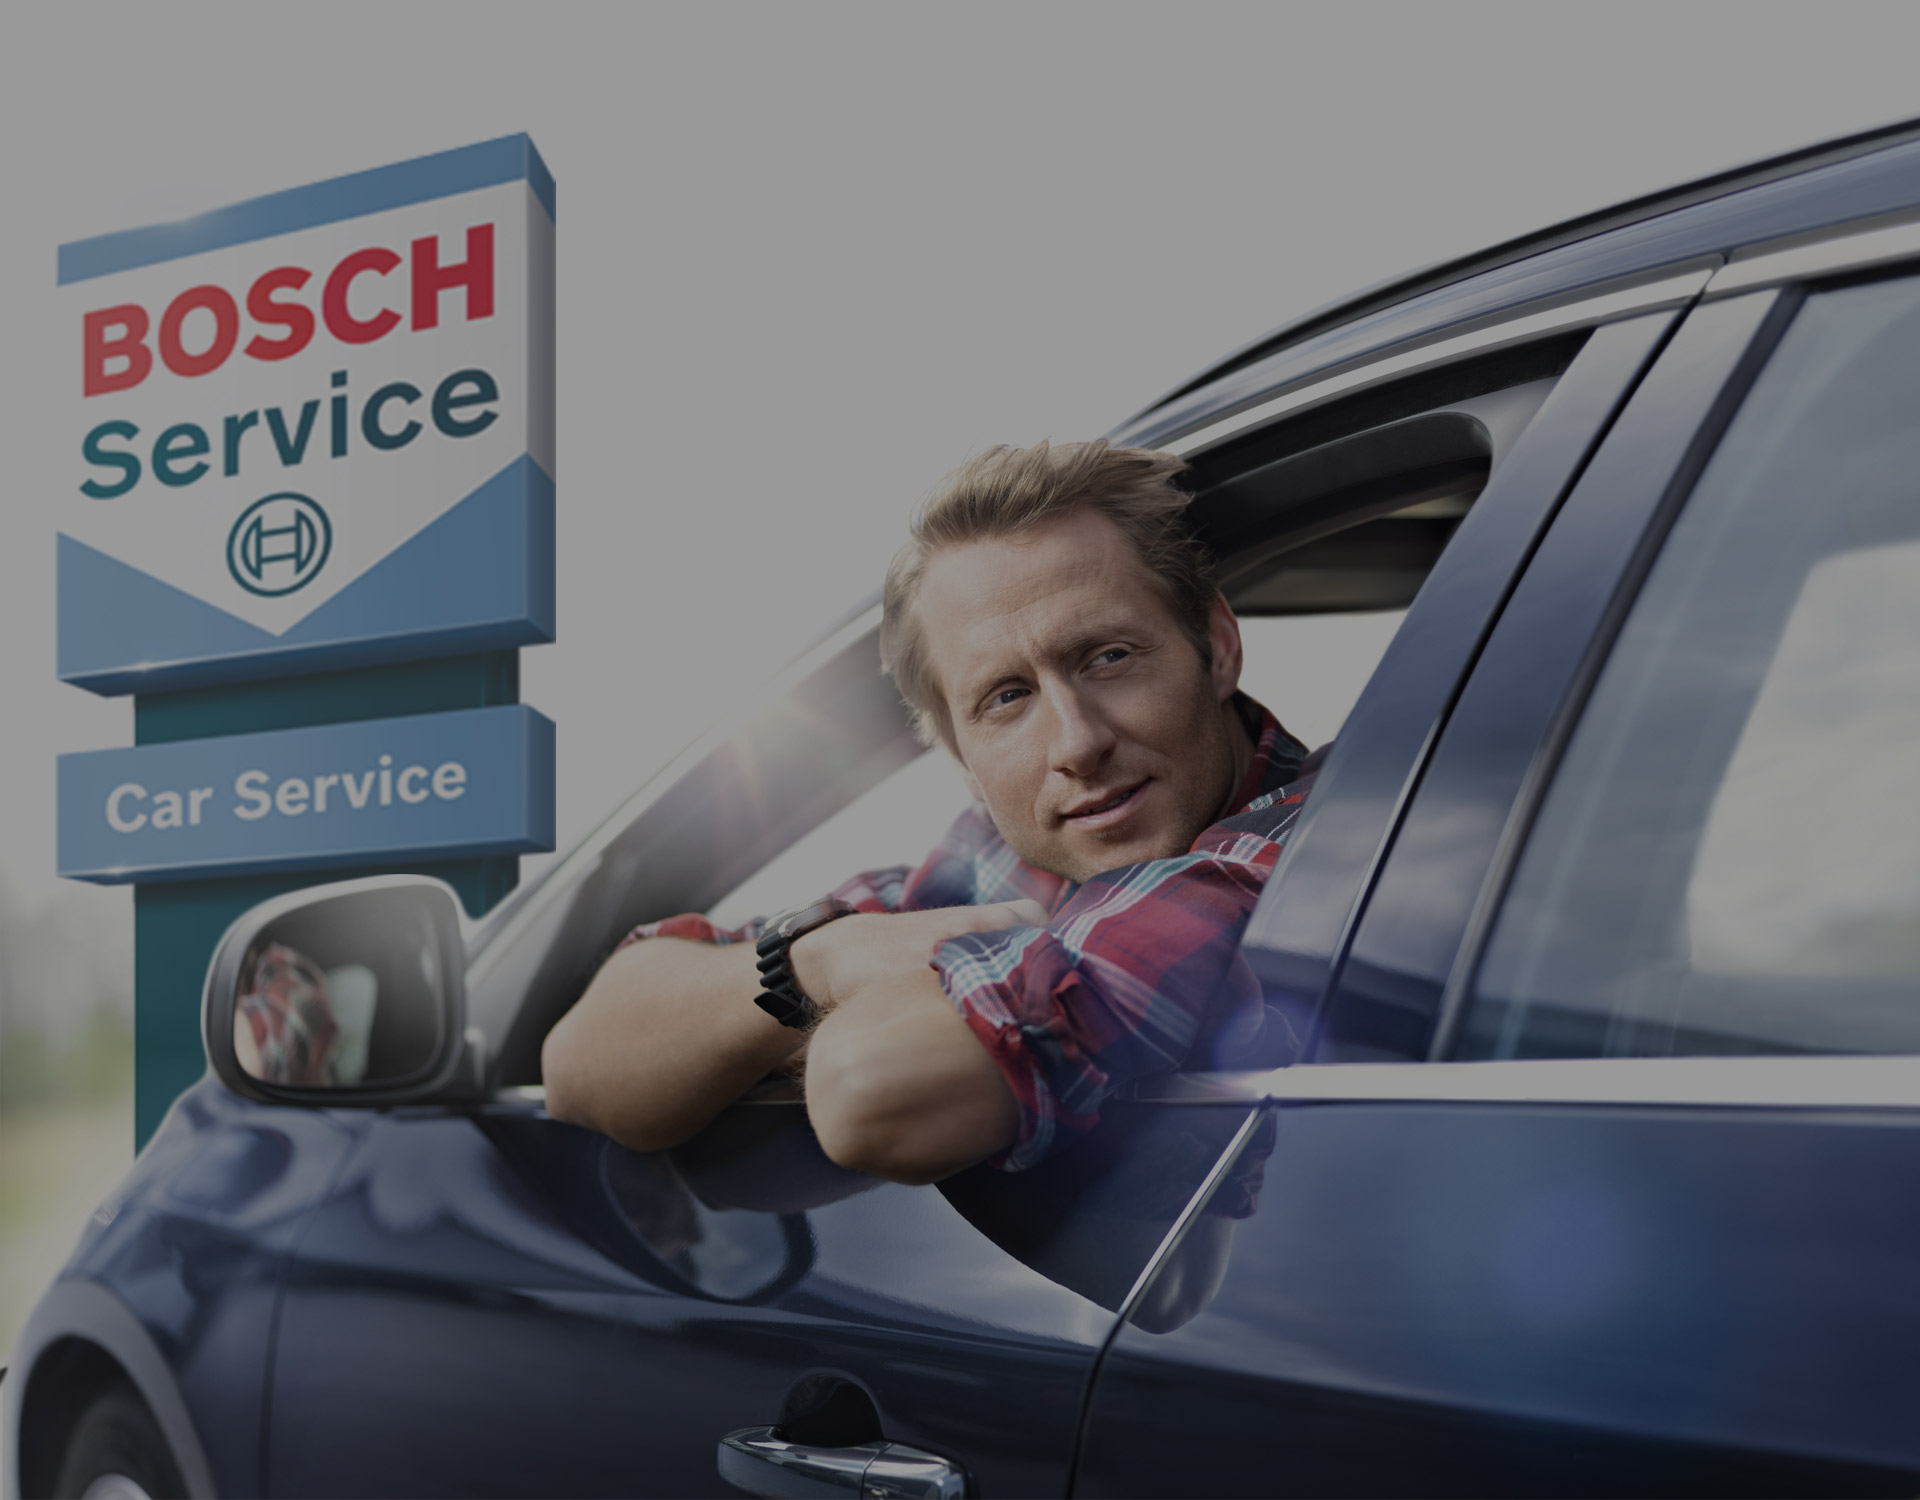 tevredenheid bosch car service